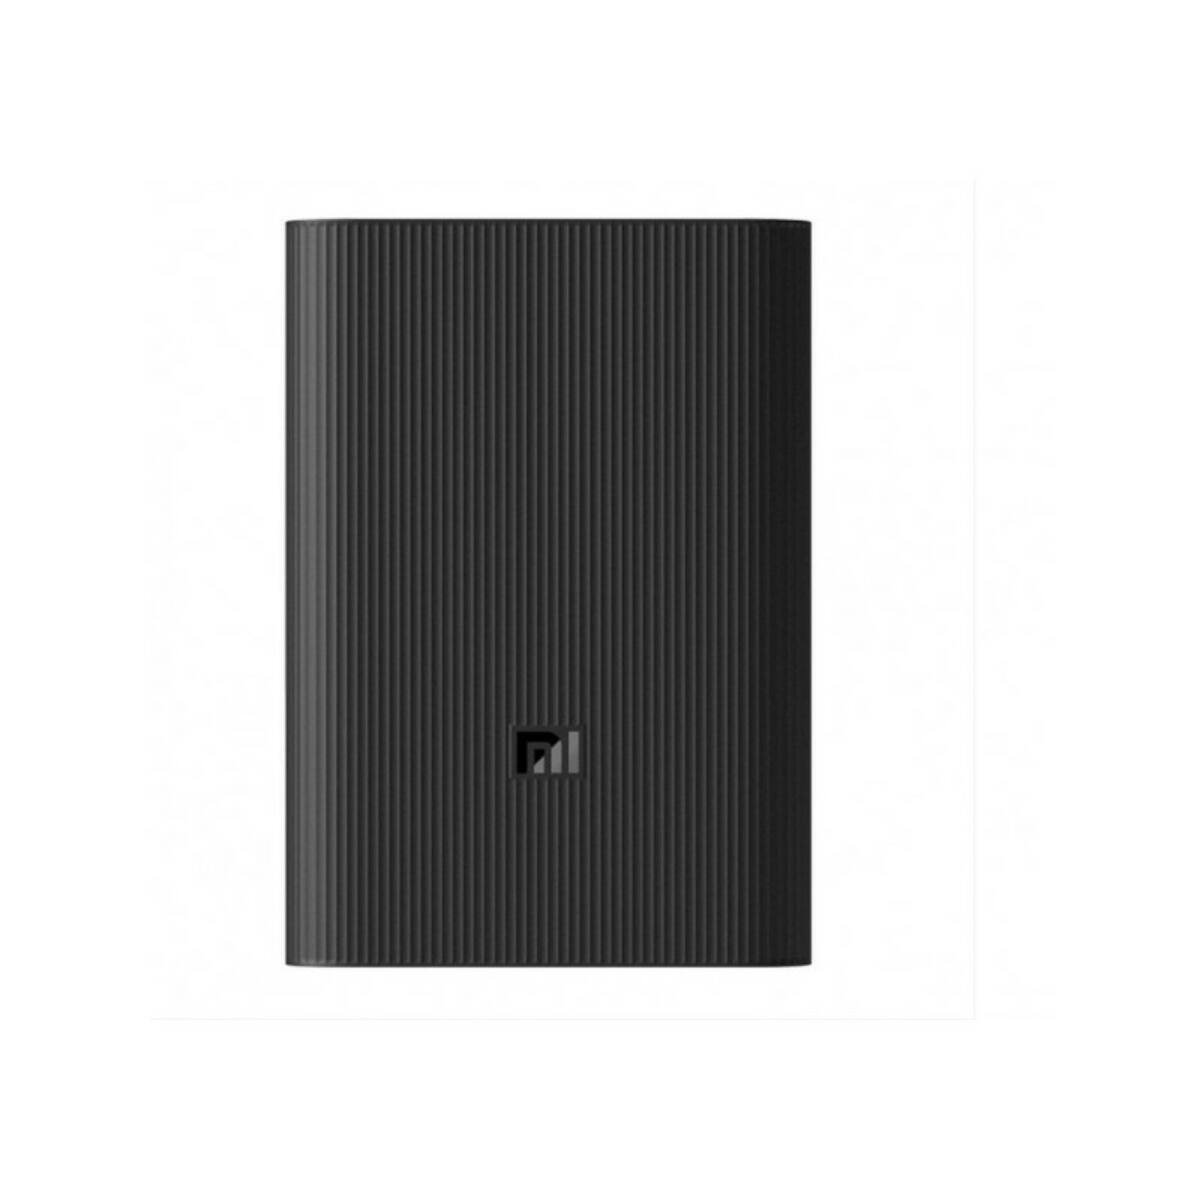 Xiaomi Power Bank 3 Ultra Compact 10.000 mAh 22,5W Fast Charge fekete EU BHR4412GL